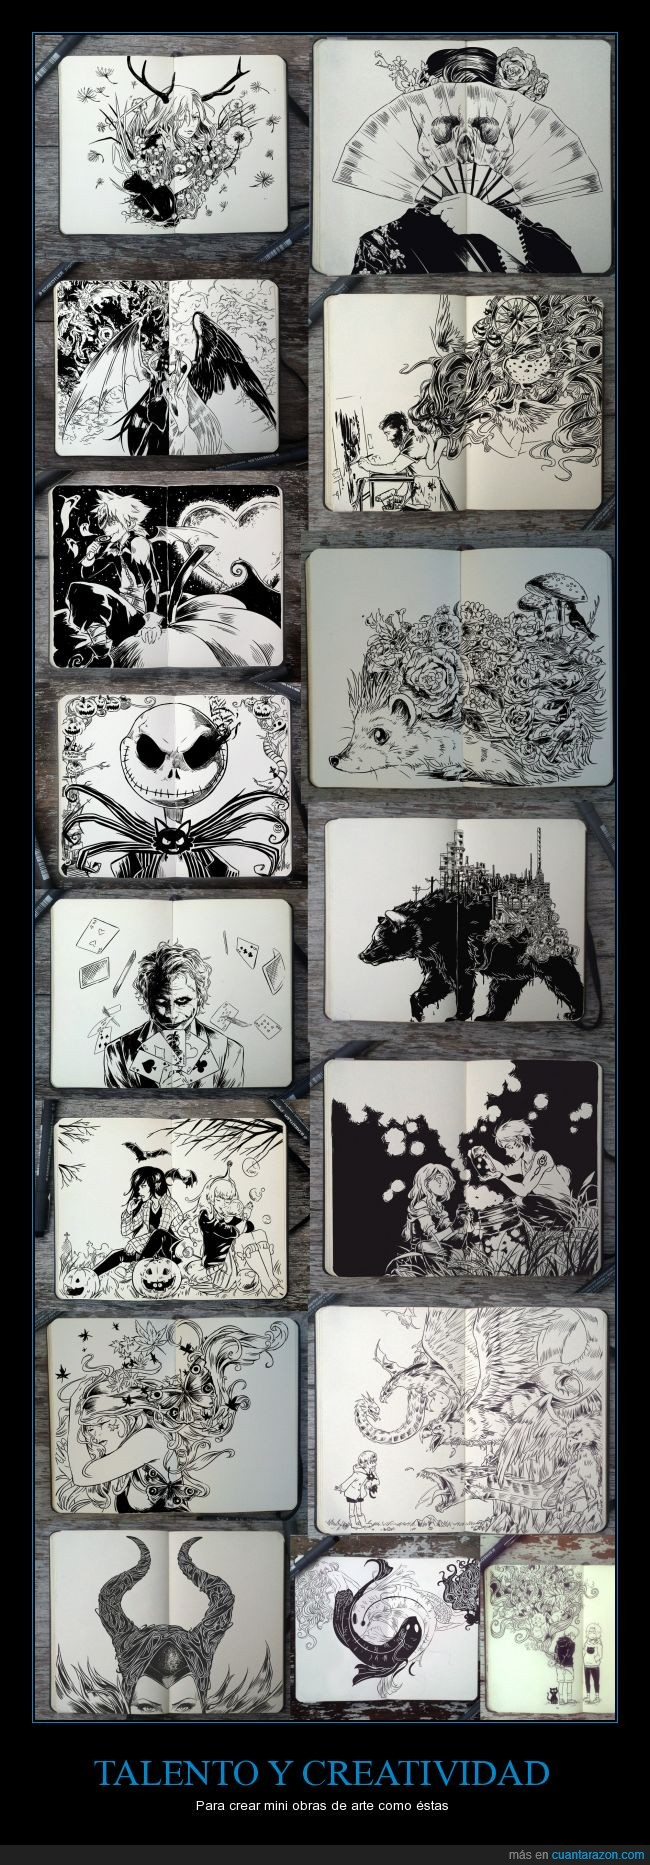 dibujo,joker,libreta,malefica,moleskine,negro,puntafina,tinta